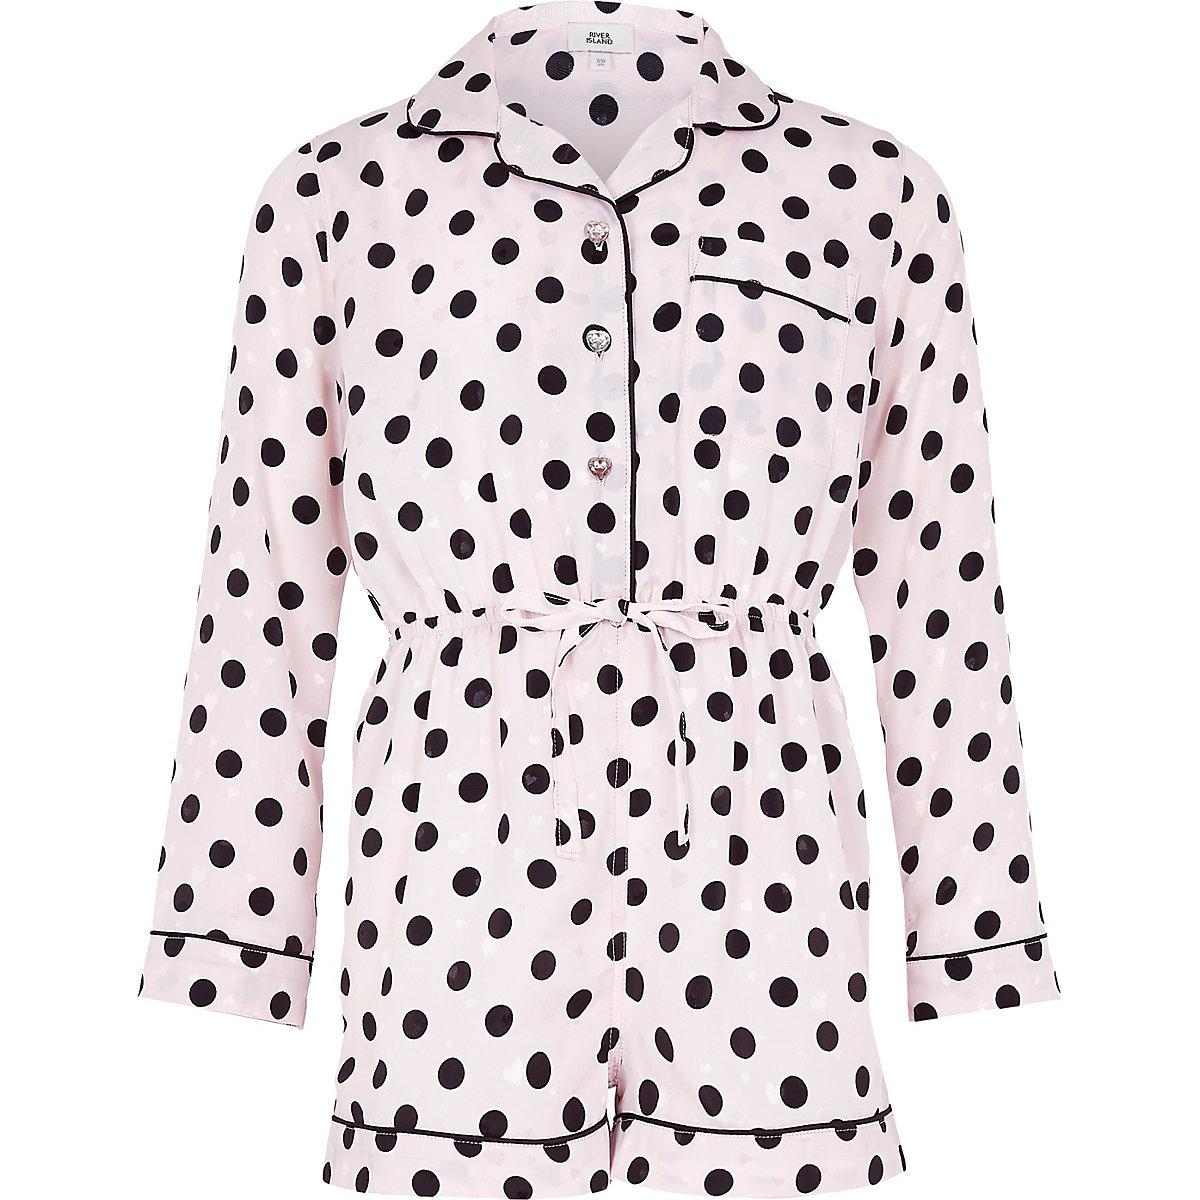 Girls pink polka dot pyjama playsuit